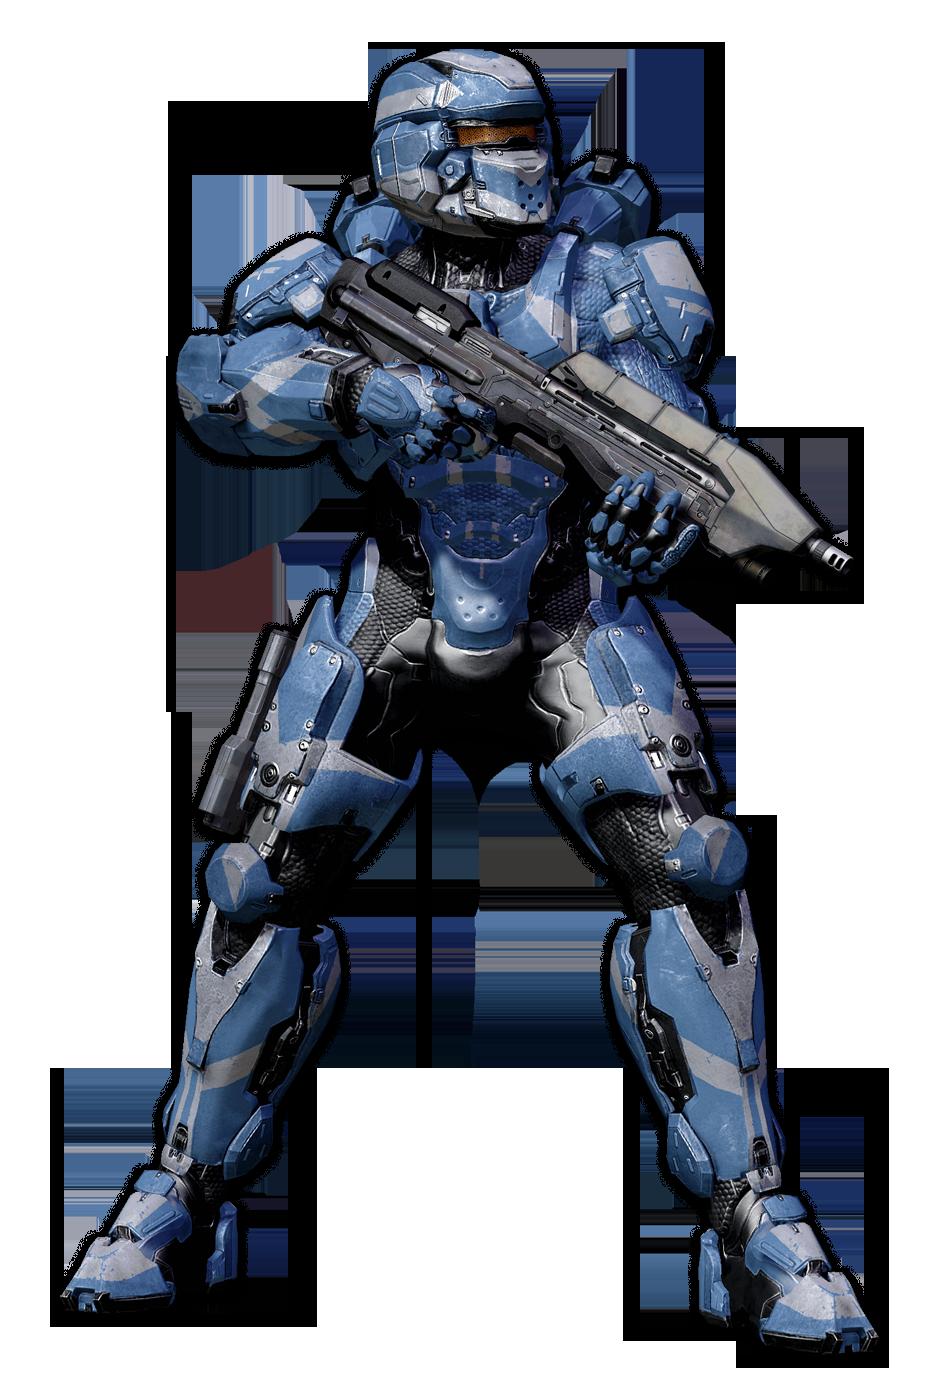 File:Spartan IV.png